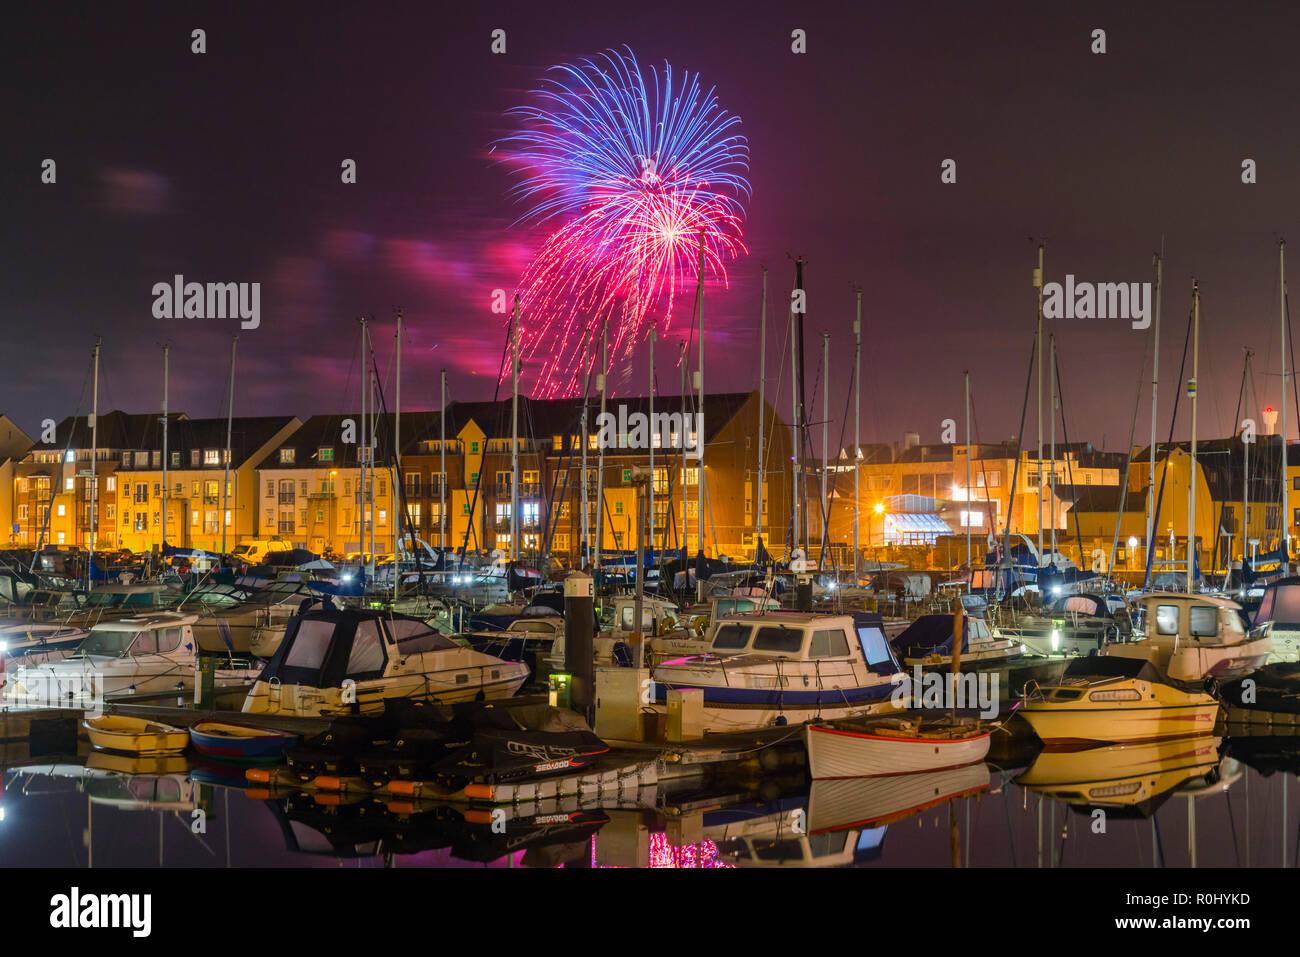 Weymouth Dorset UK 5th November 2018 Exploding Fireworks Light Up The Night